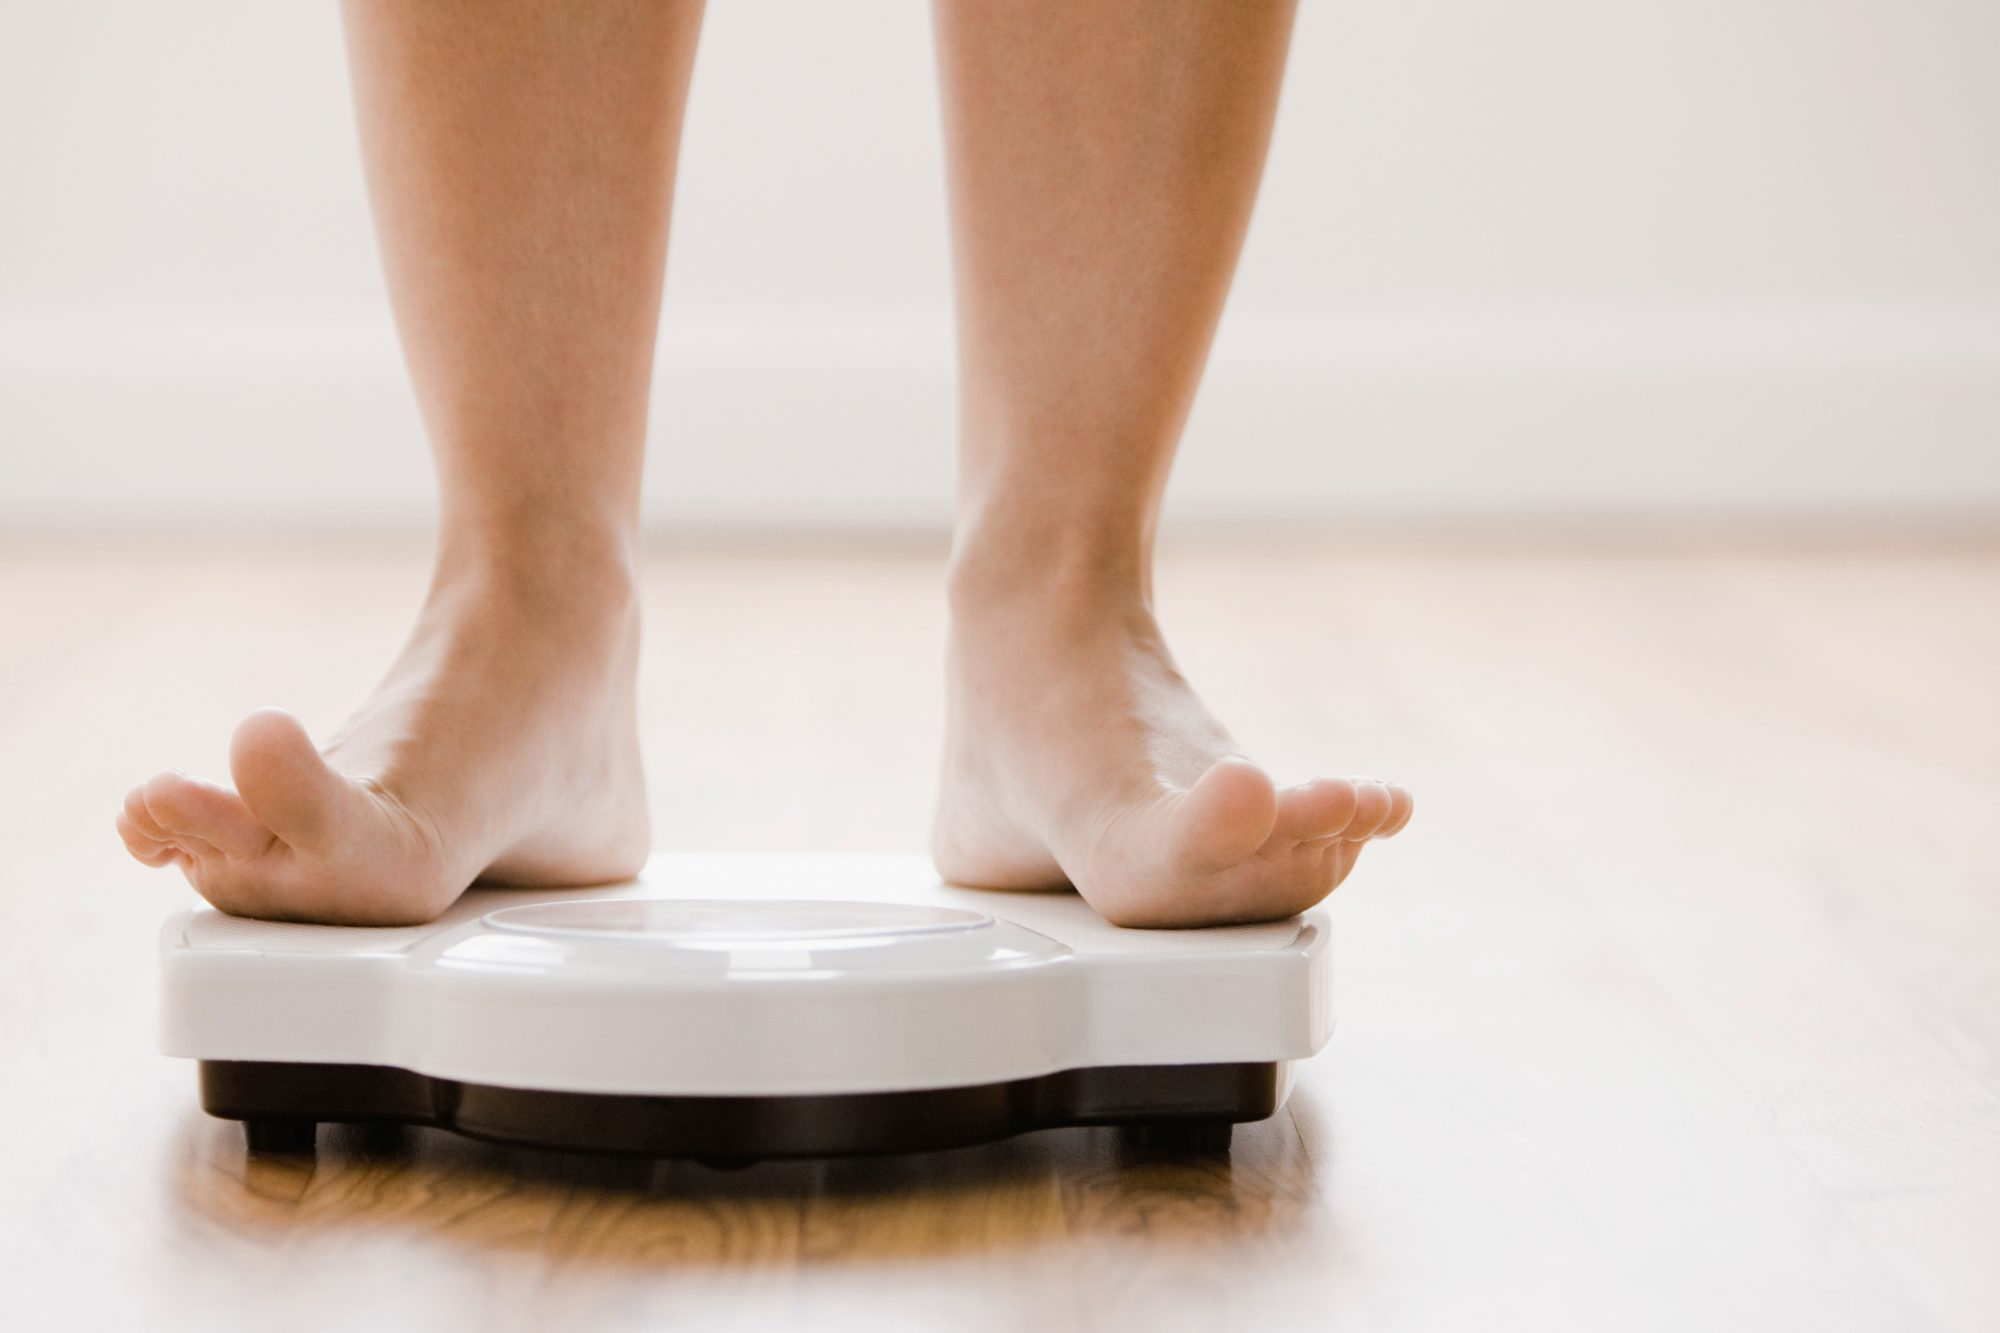 compliment body size detrimental stop body positivity self image confidence